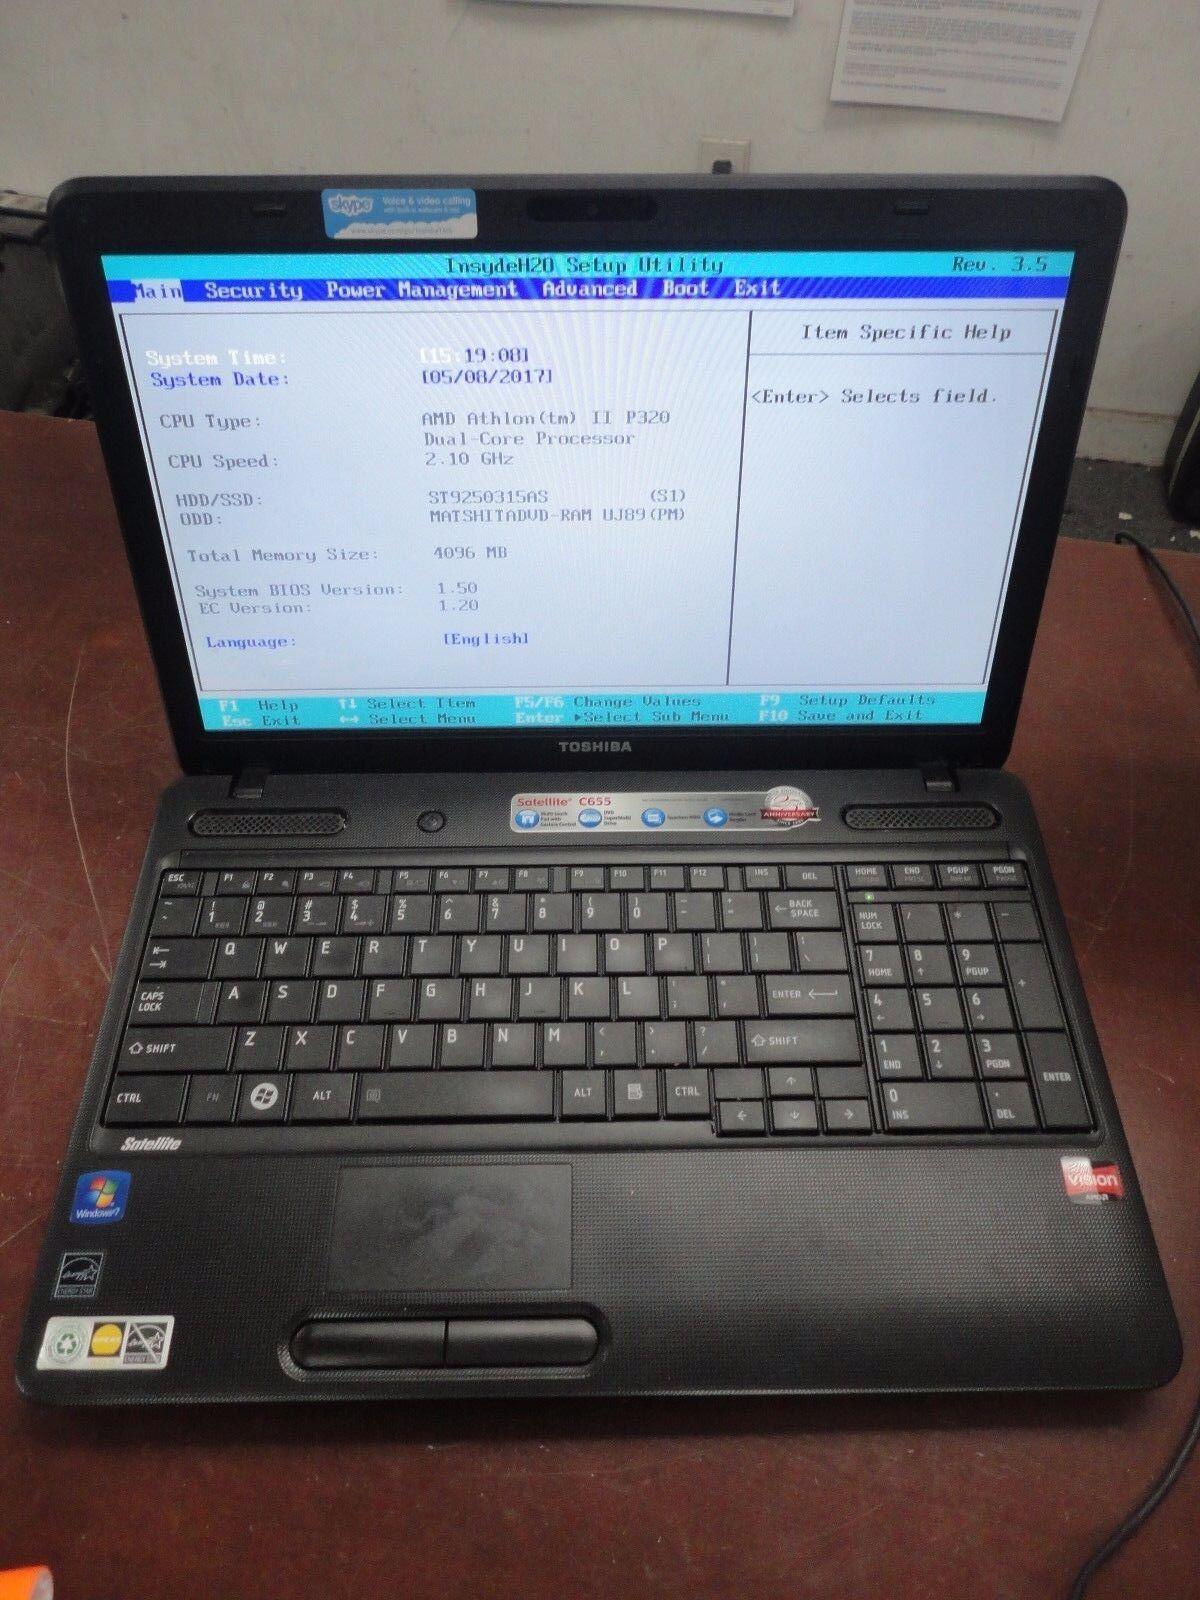 toshiba satellite c655 drivers windows 7 64 bit download